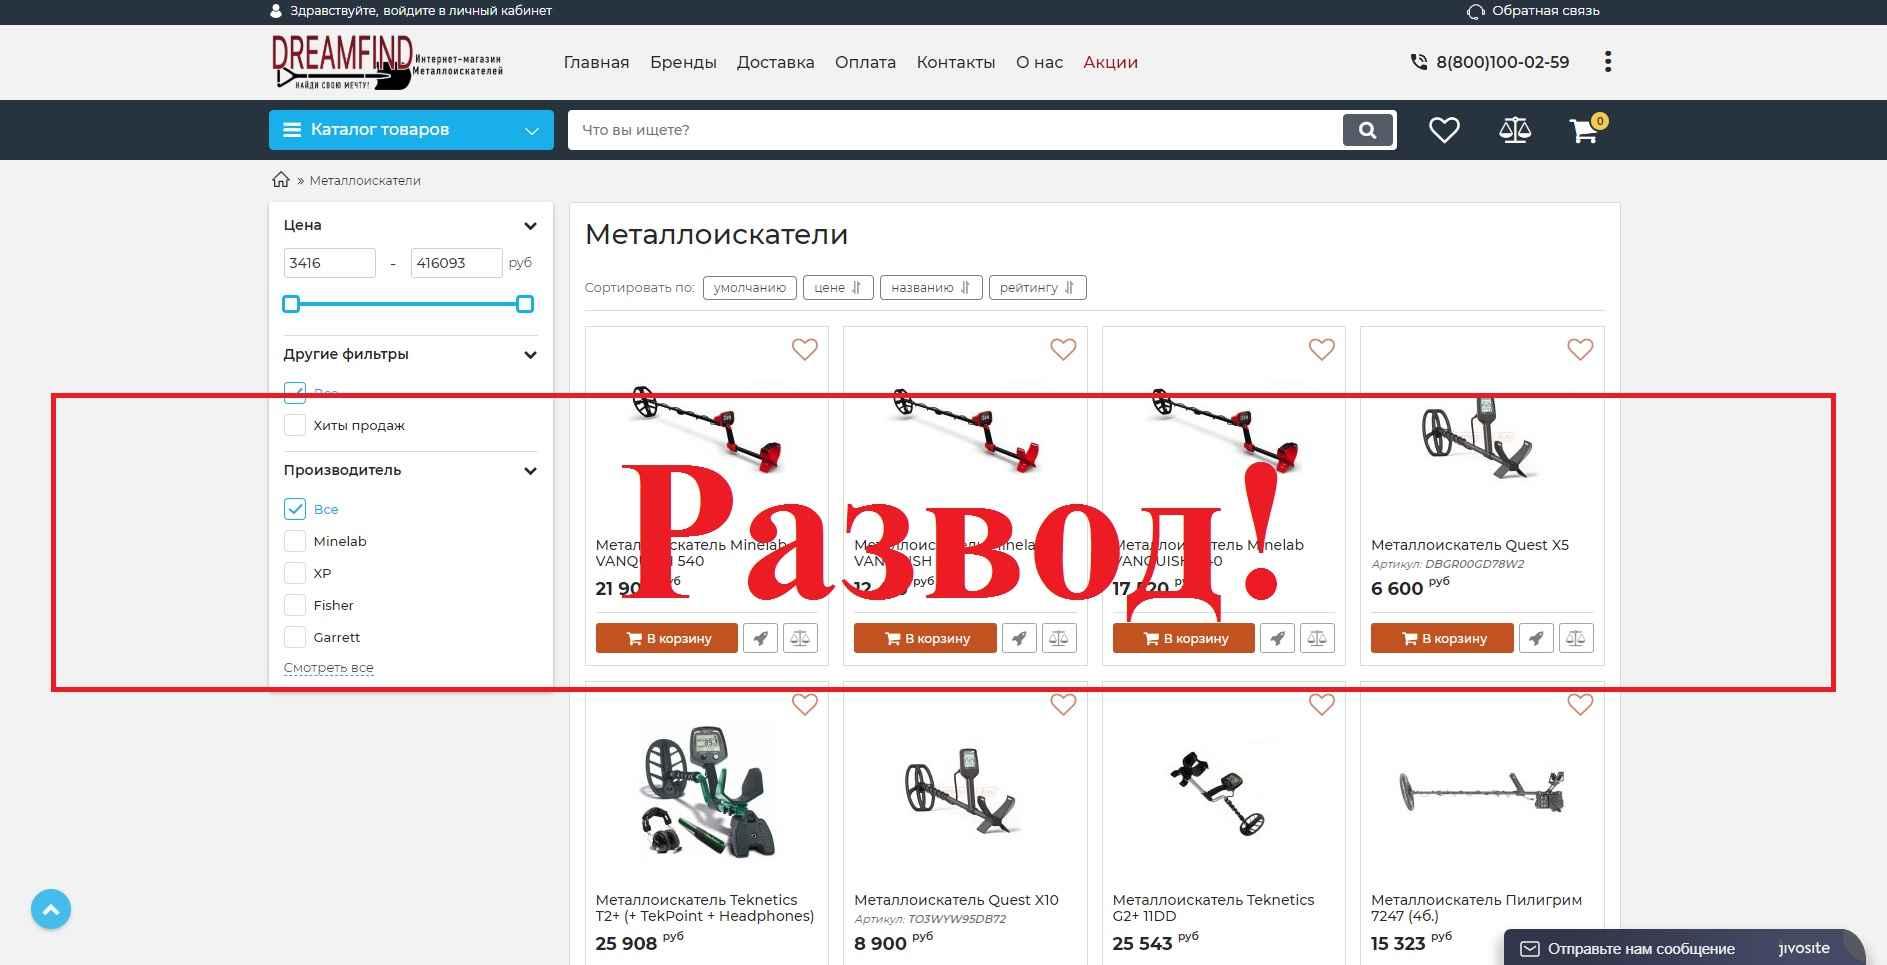 Dreamfind (dreamfind.ru) – отзывы о сайте. Мошенники?